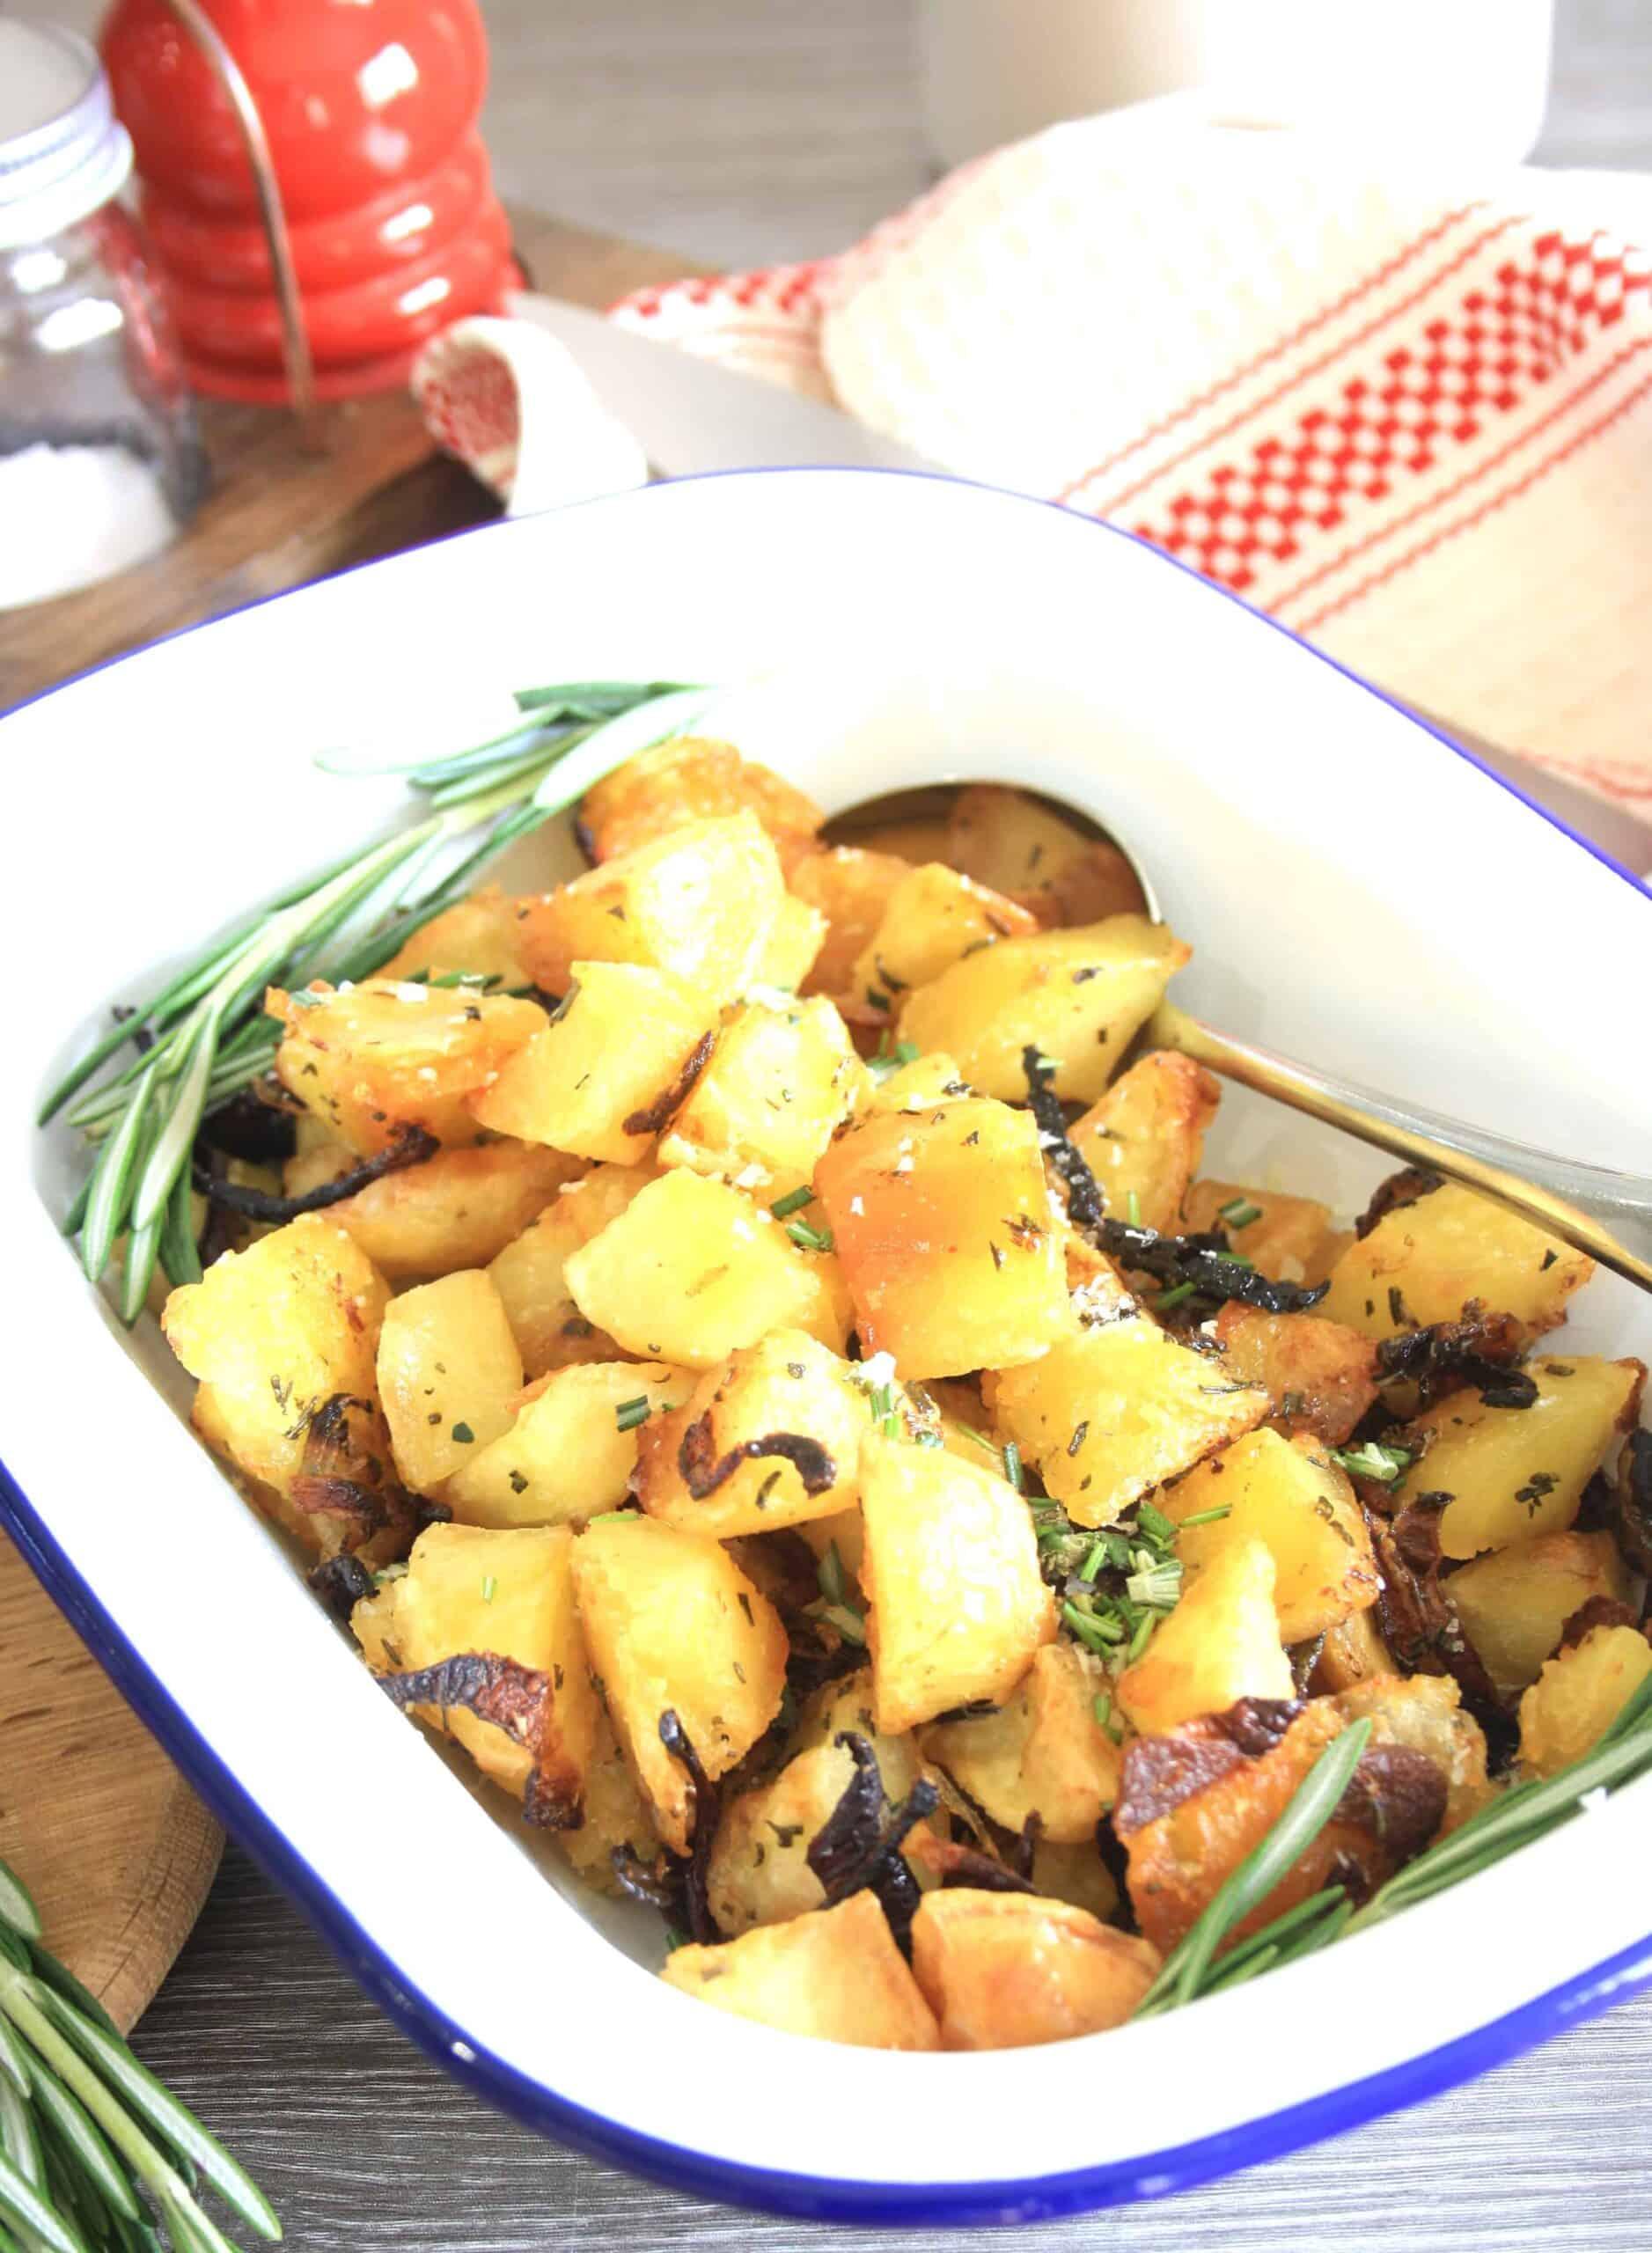 dish of potatoes.